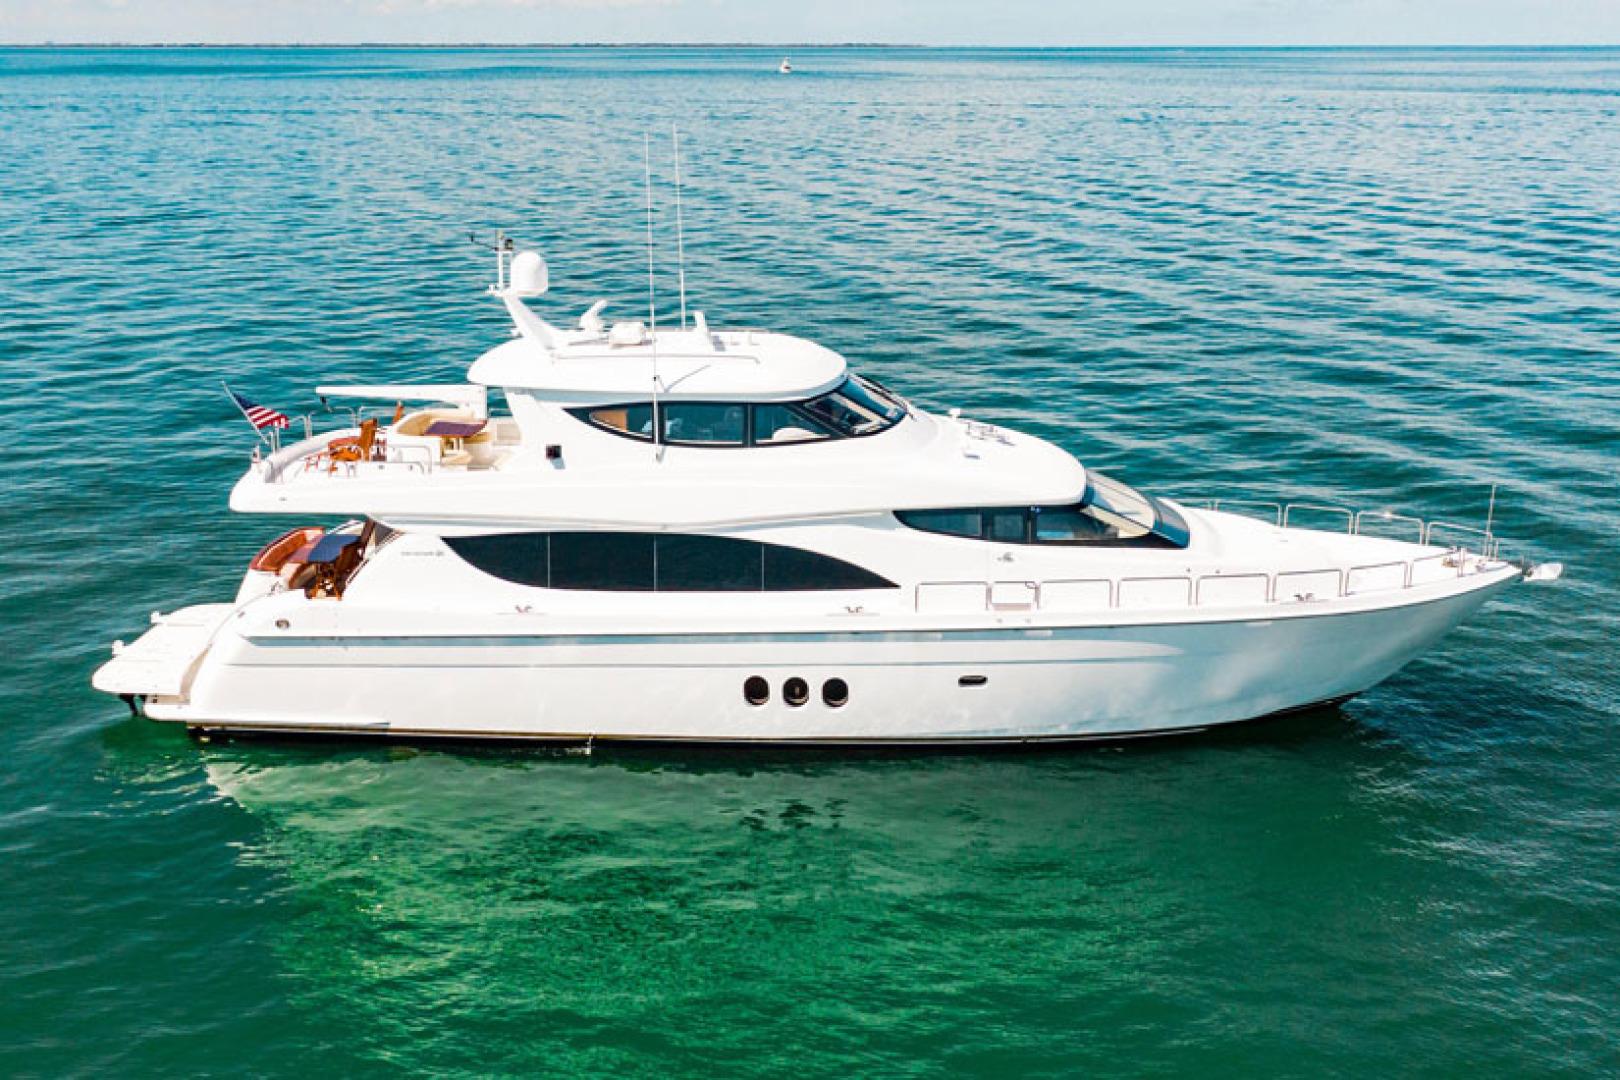 Hatteras-80 Motor Yacht 2008-Galati Yacht Sales Trade Anna Maria-Florida-United States-2008 Hatteras 80 Motor Yacht  Galati Yacht Sales Trade-1466289 | Thumbnail